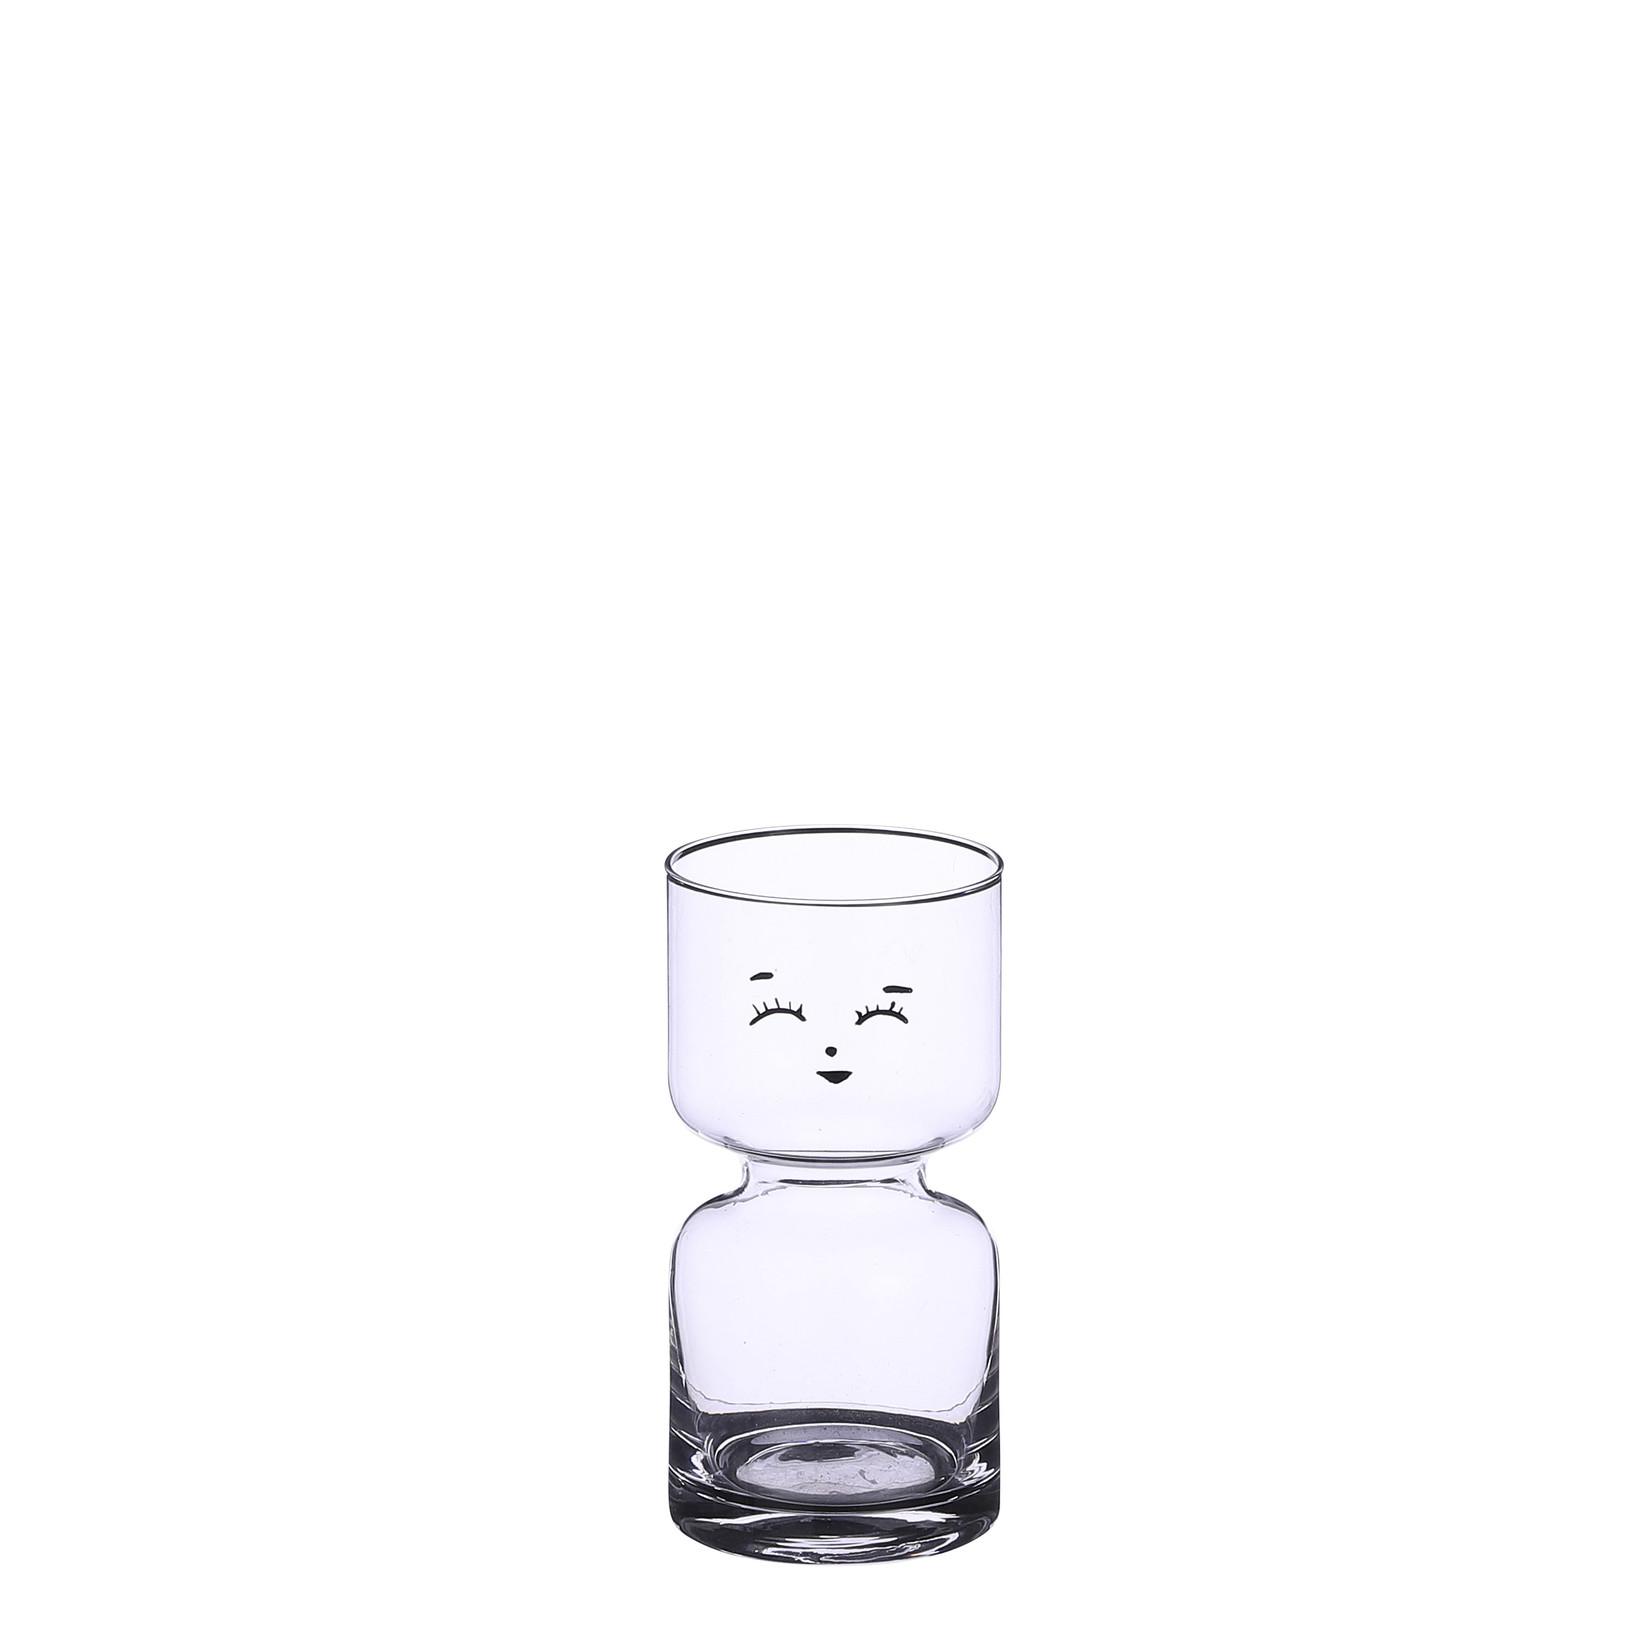 Mica Decorations Vase glass